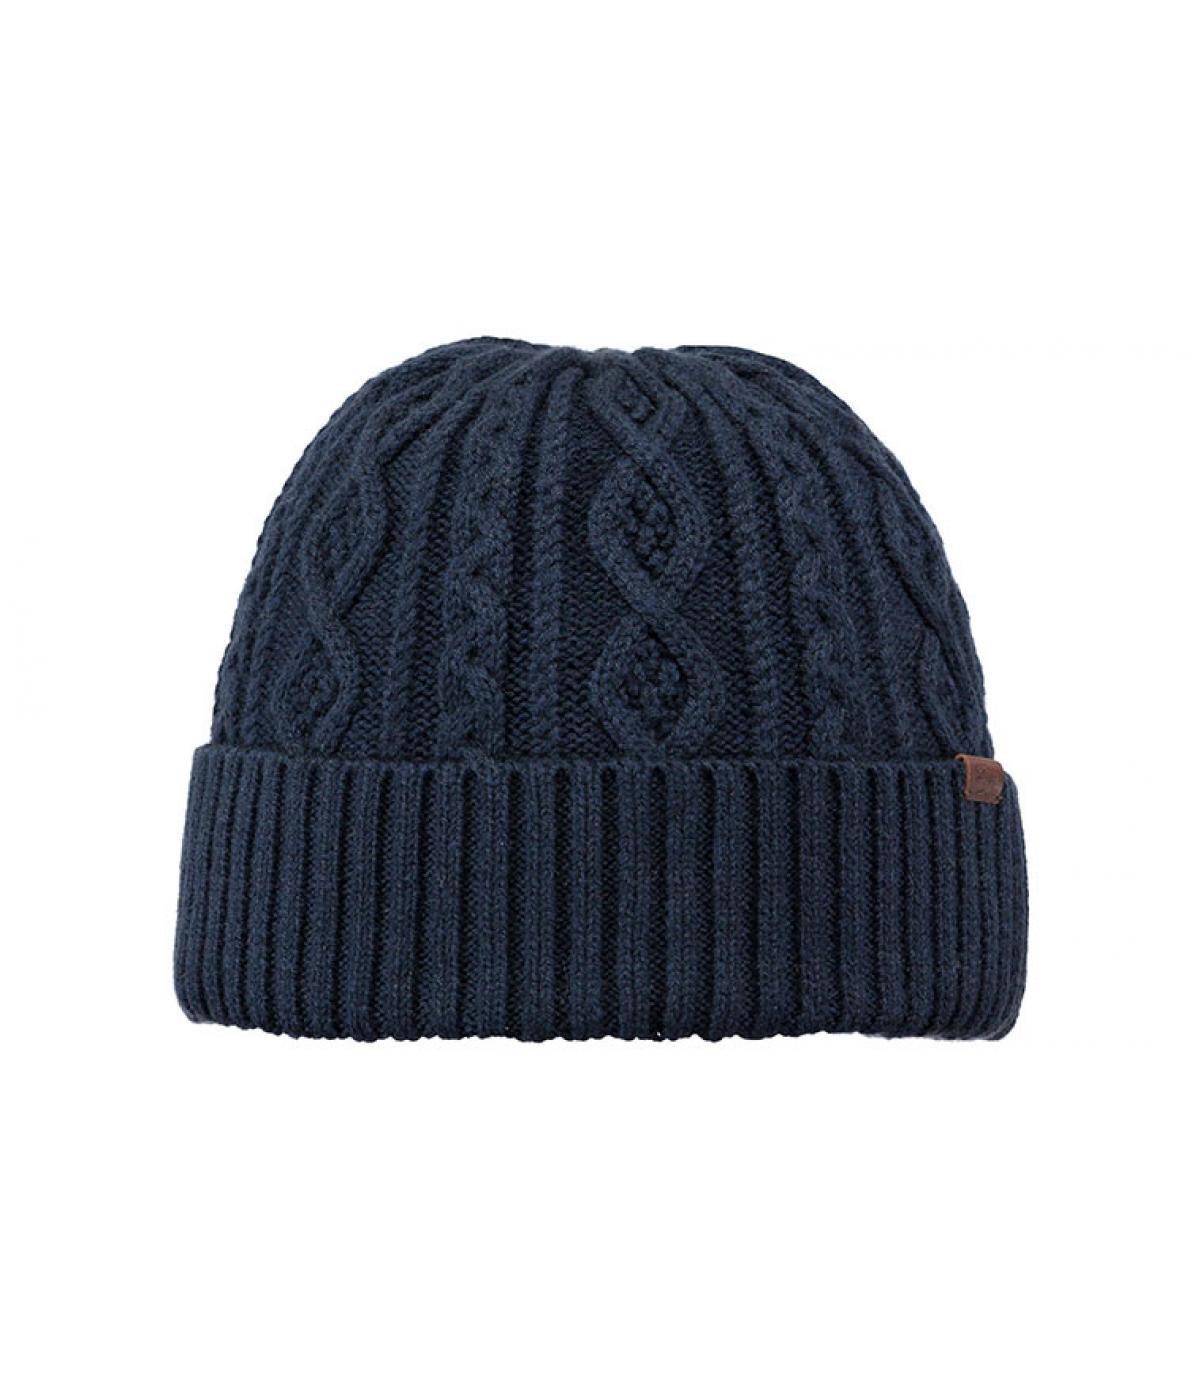 Mütze mit Revers marineblau Zopfmuster